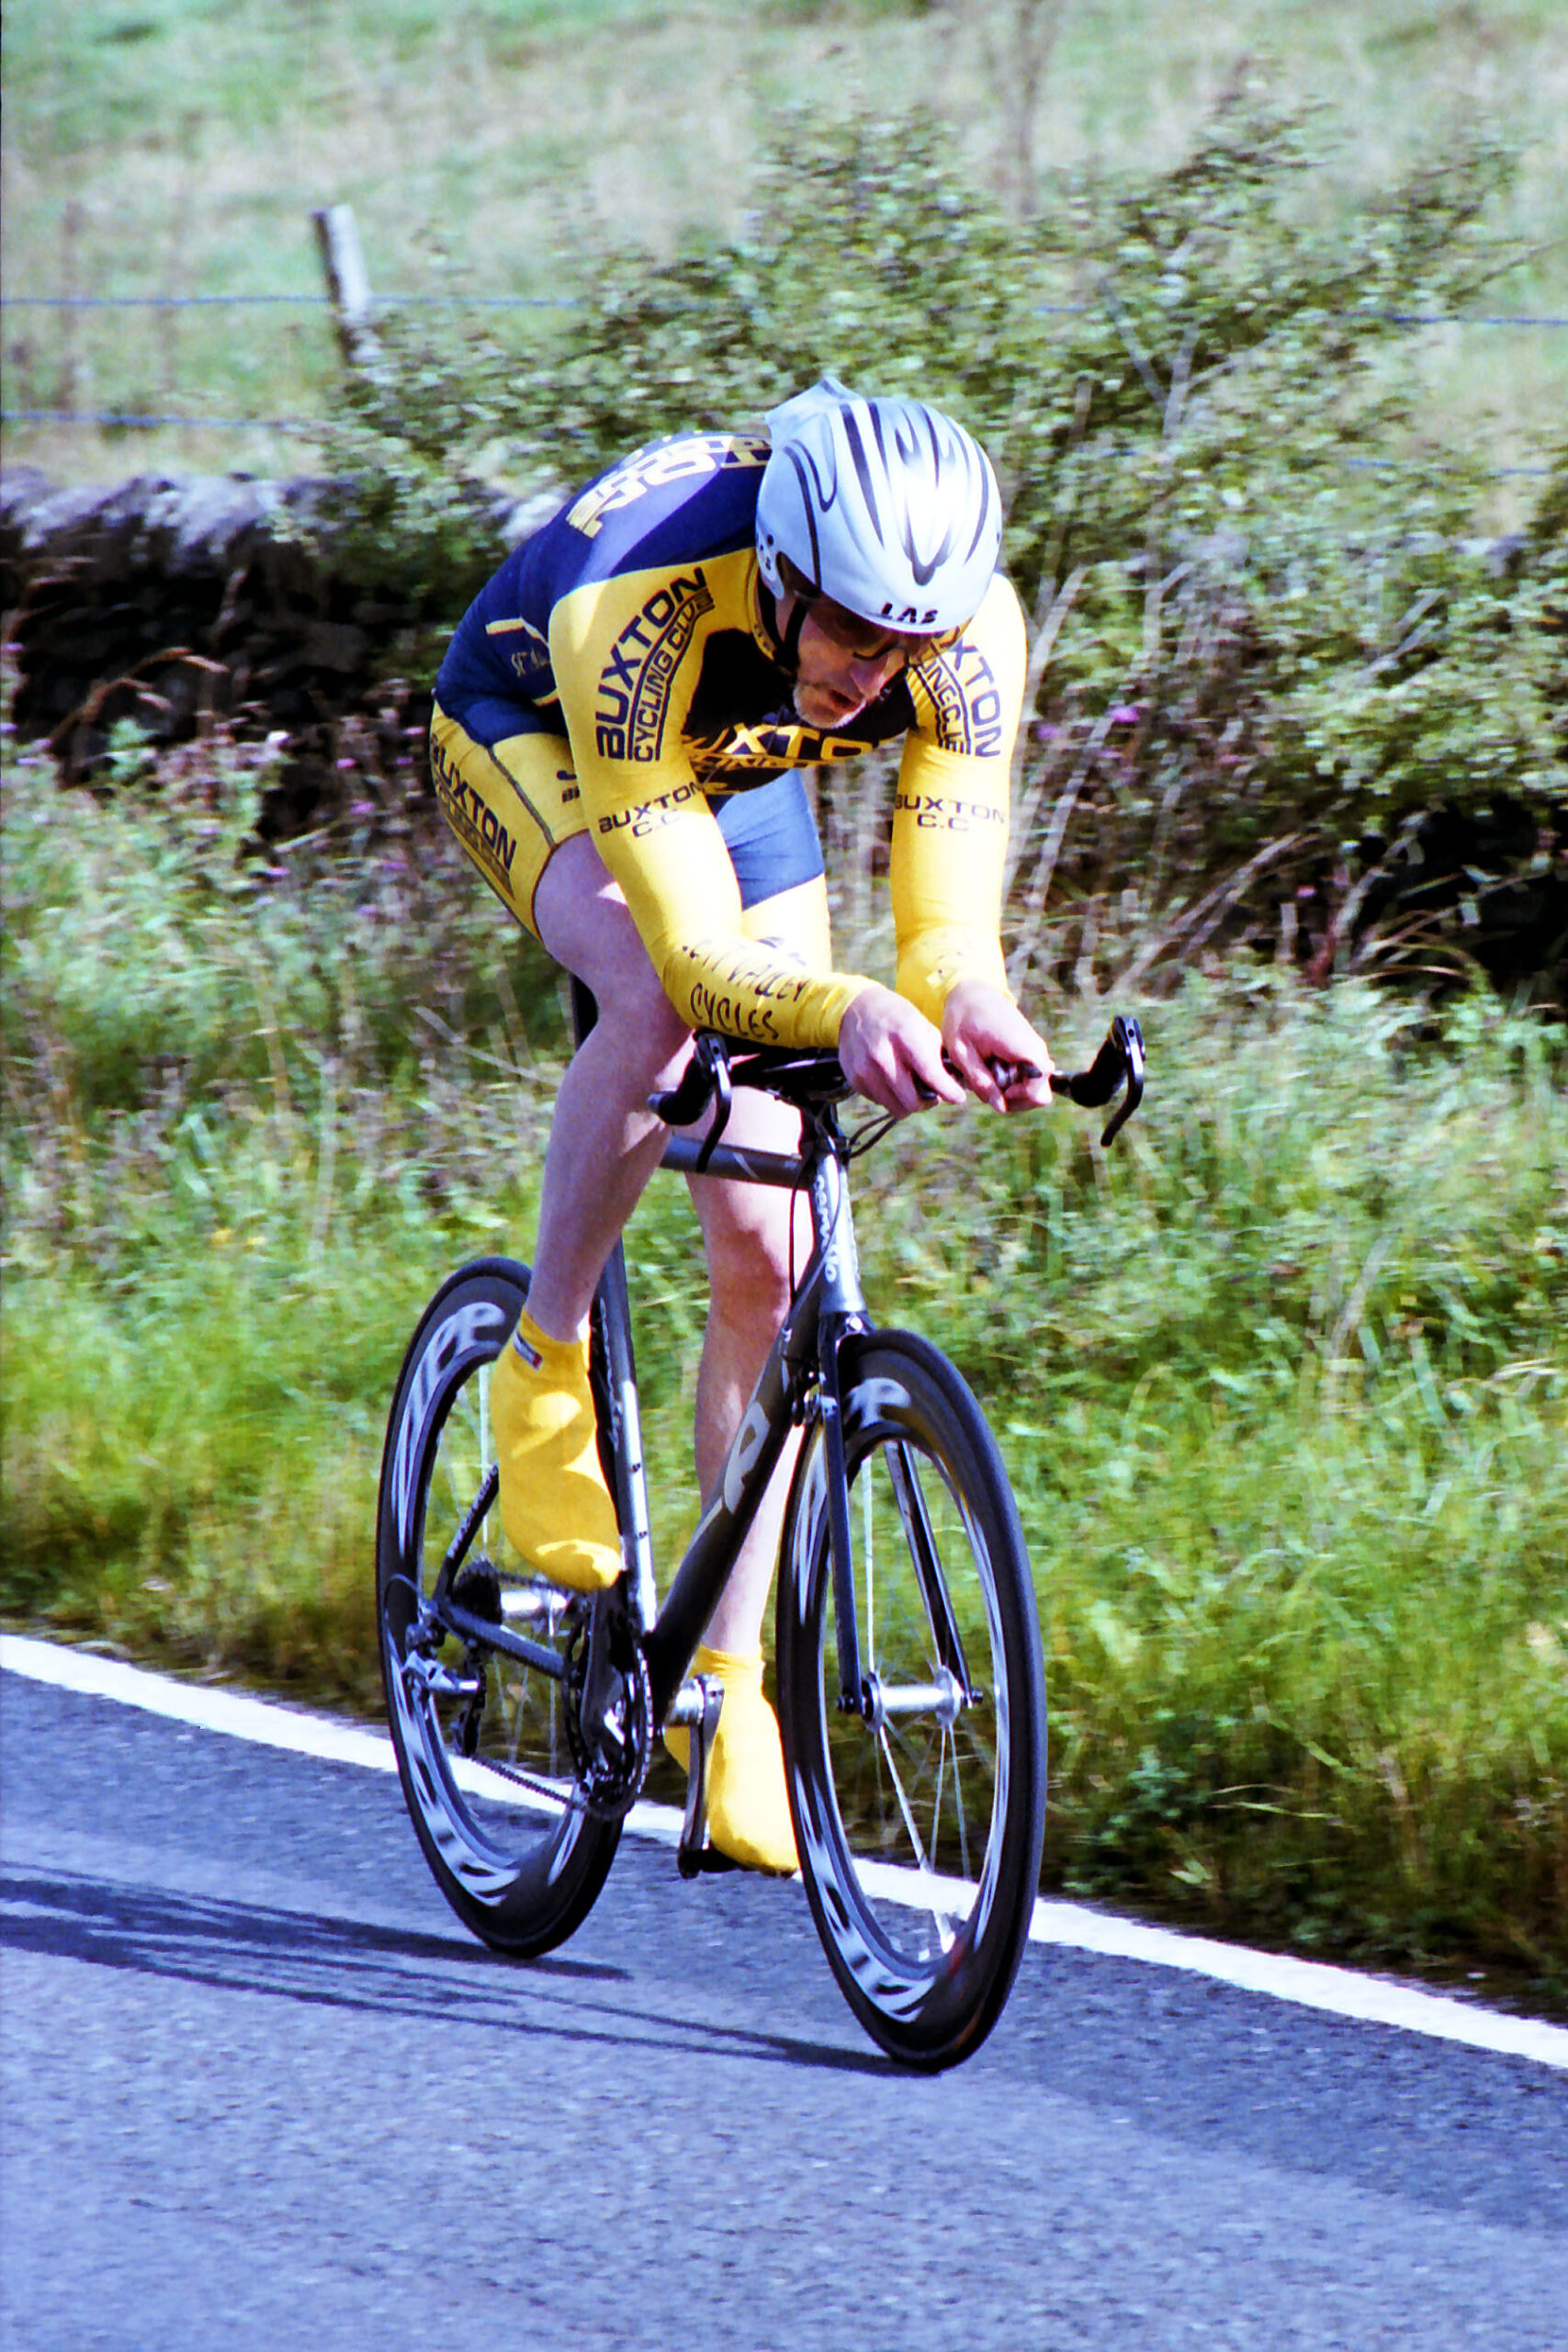 Mostyn Bullock in the 2010 Long Hill open hill climb (photo: C. Lea)